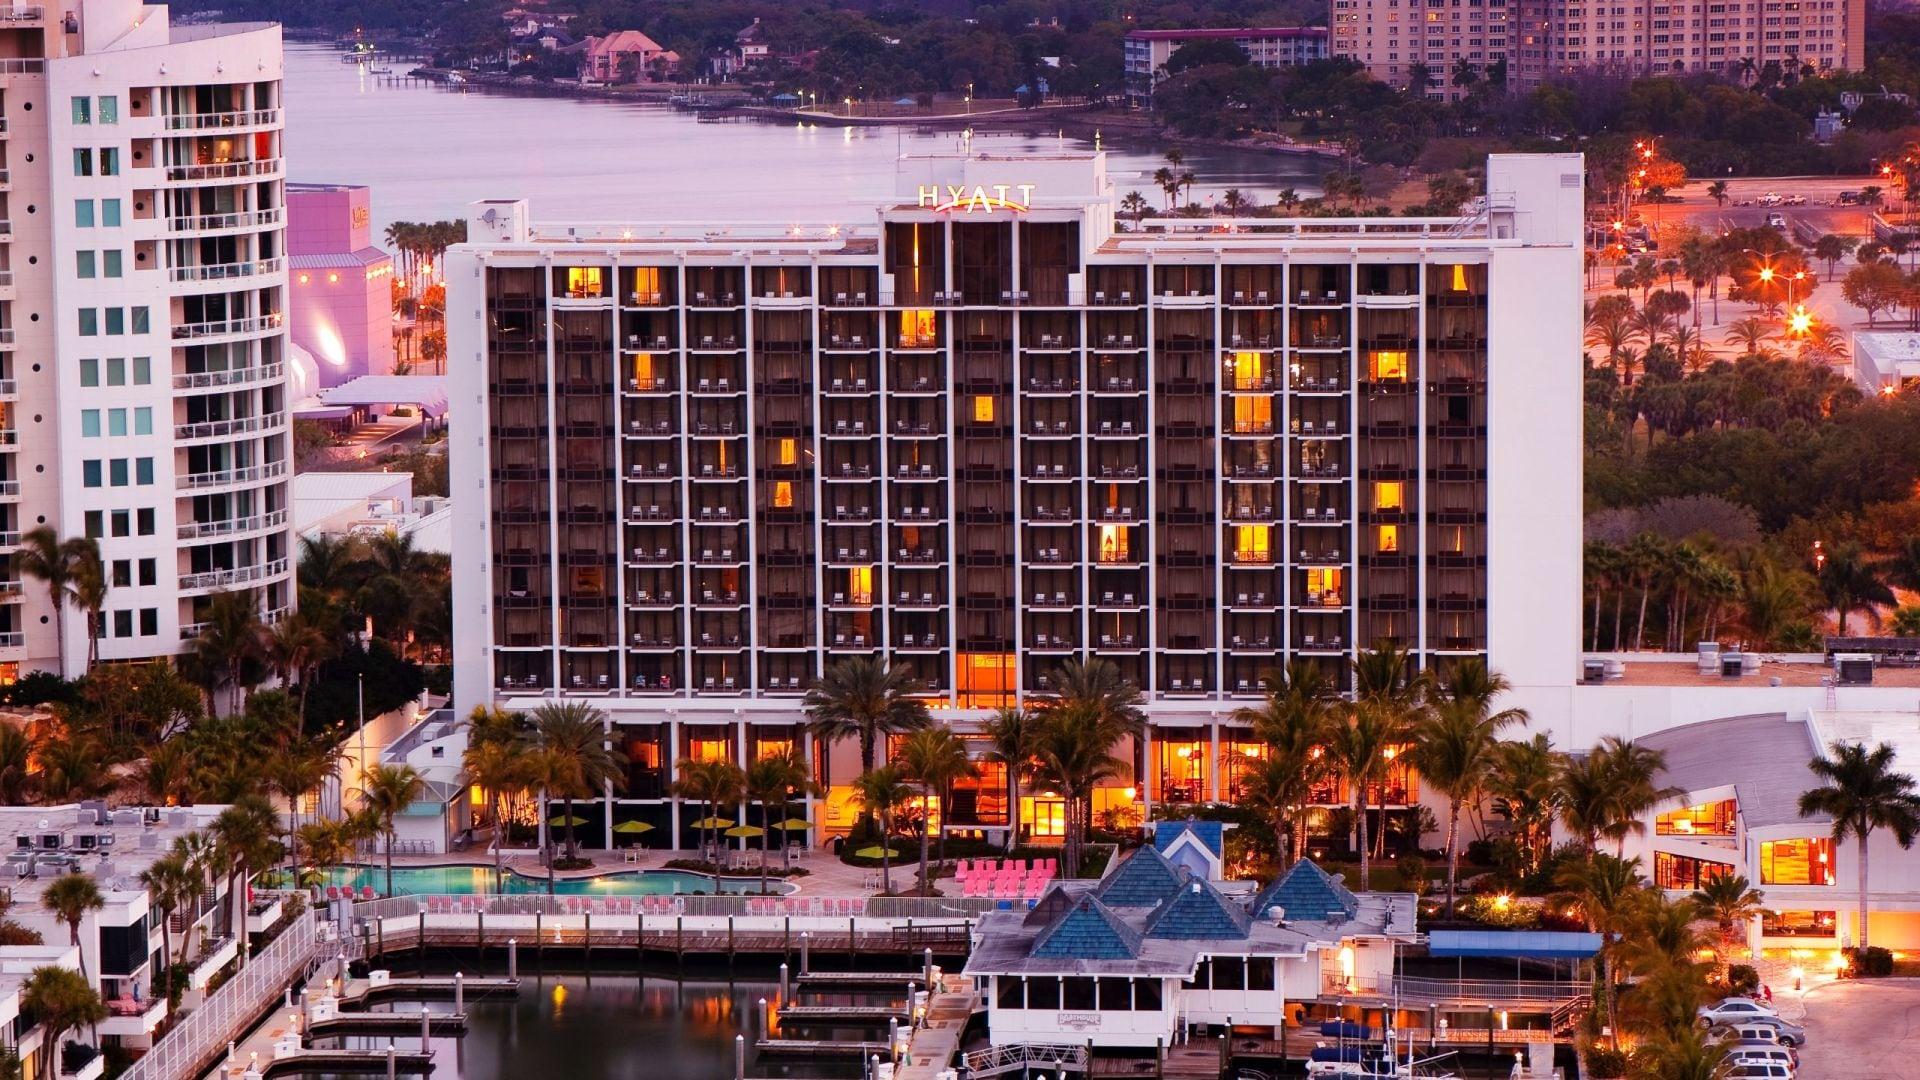 Hyatt Regency Sarasota Photos + Reviews